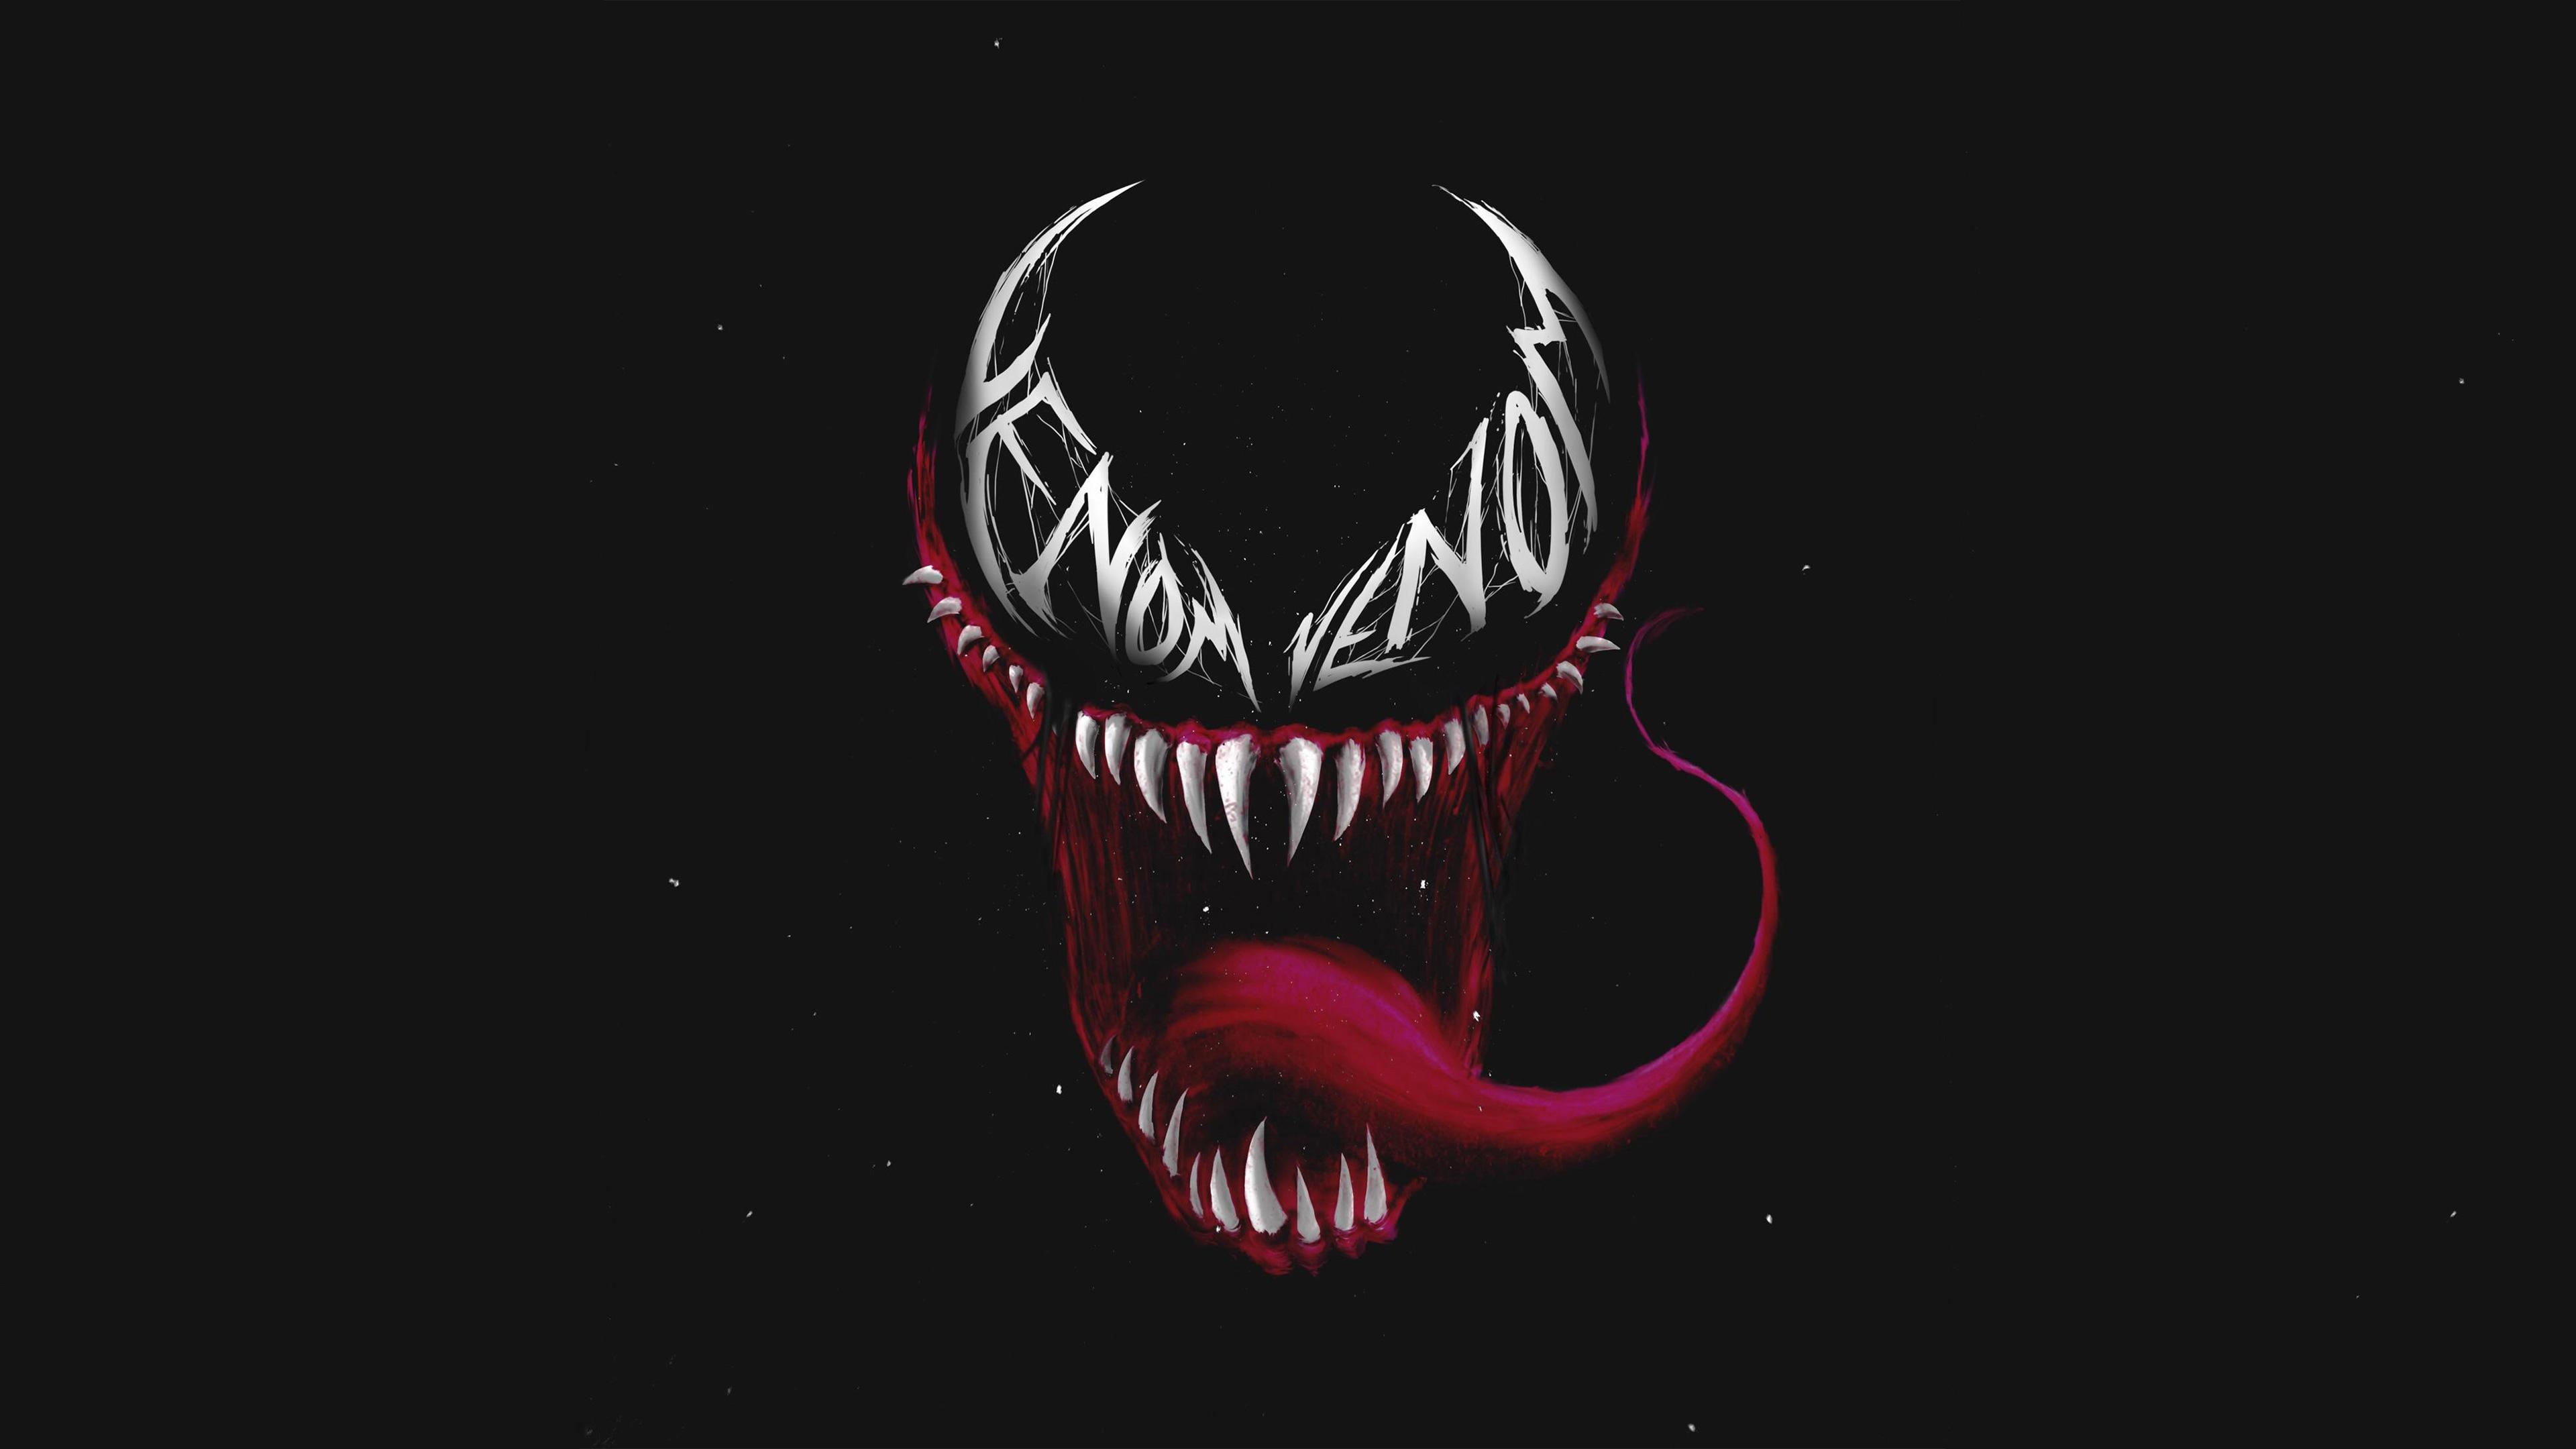 Venom Art 4K Wallpaper - Best Wallpapers